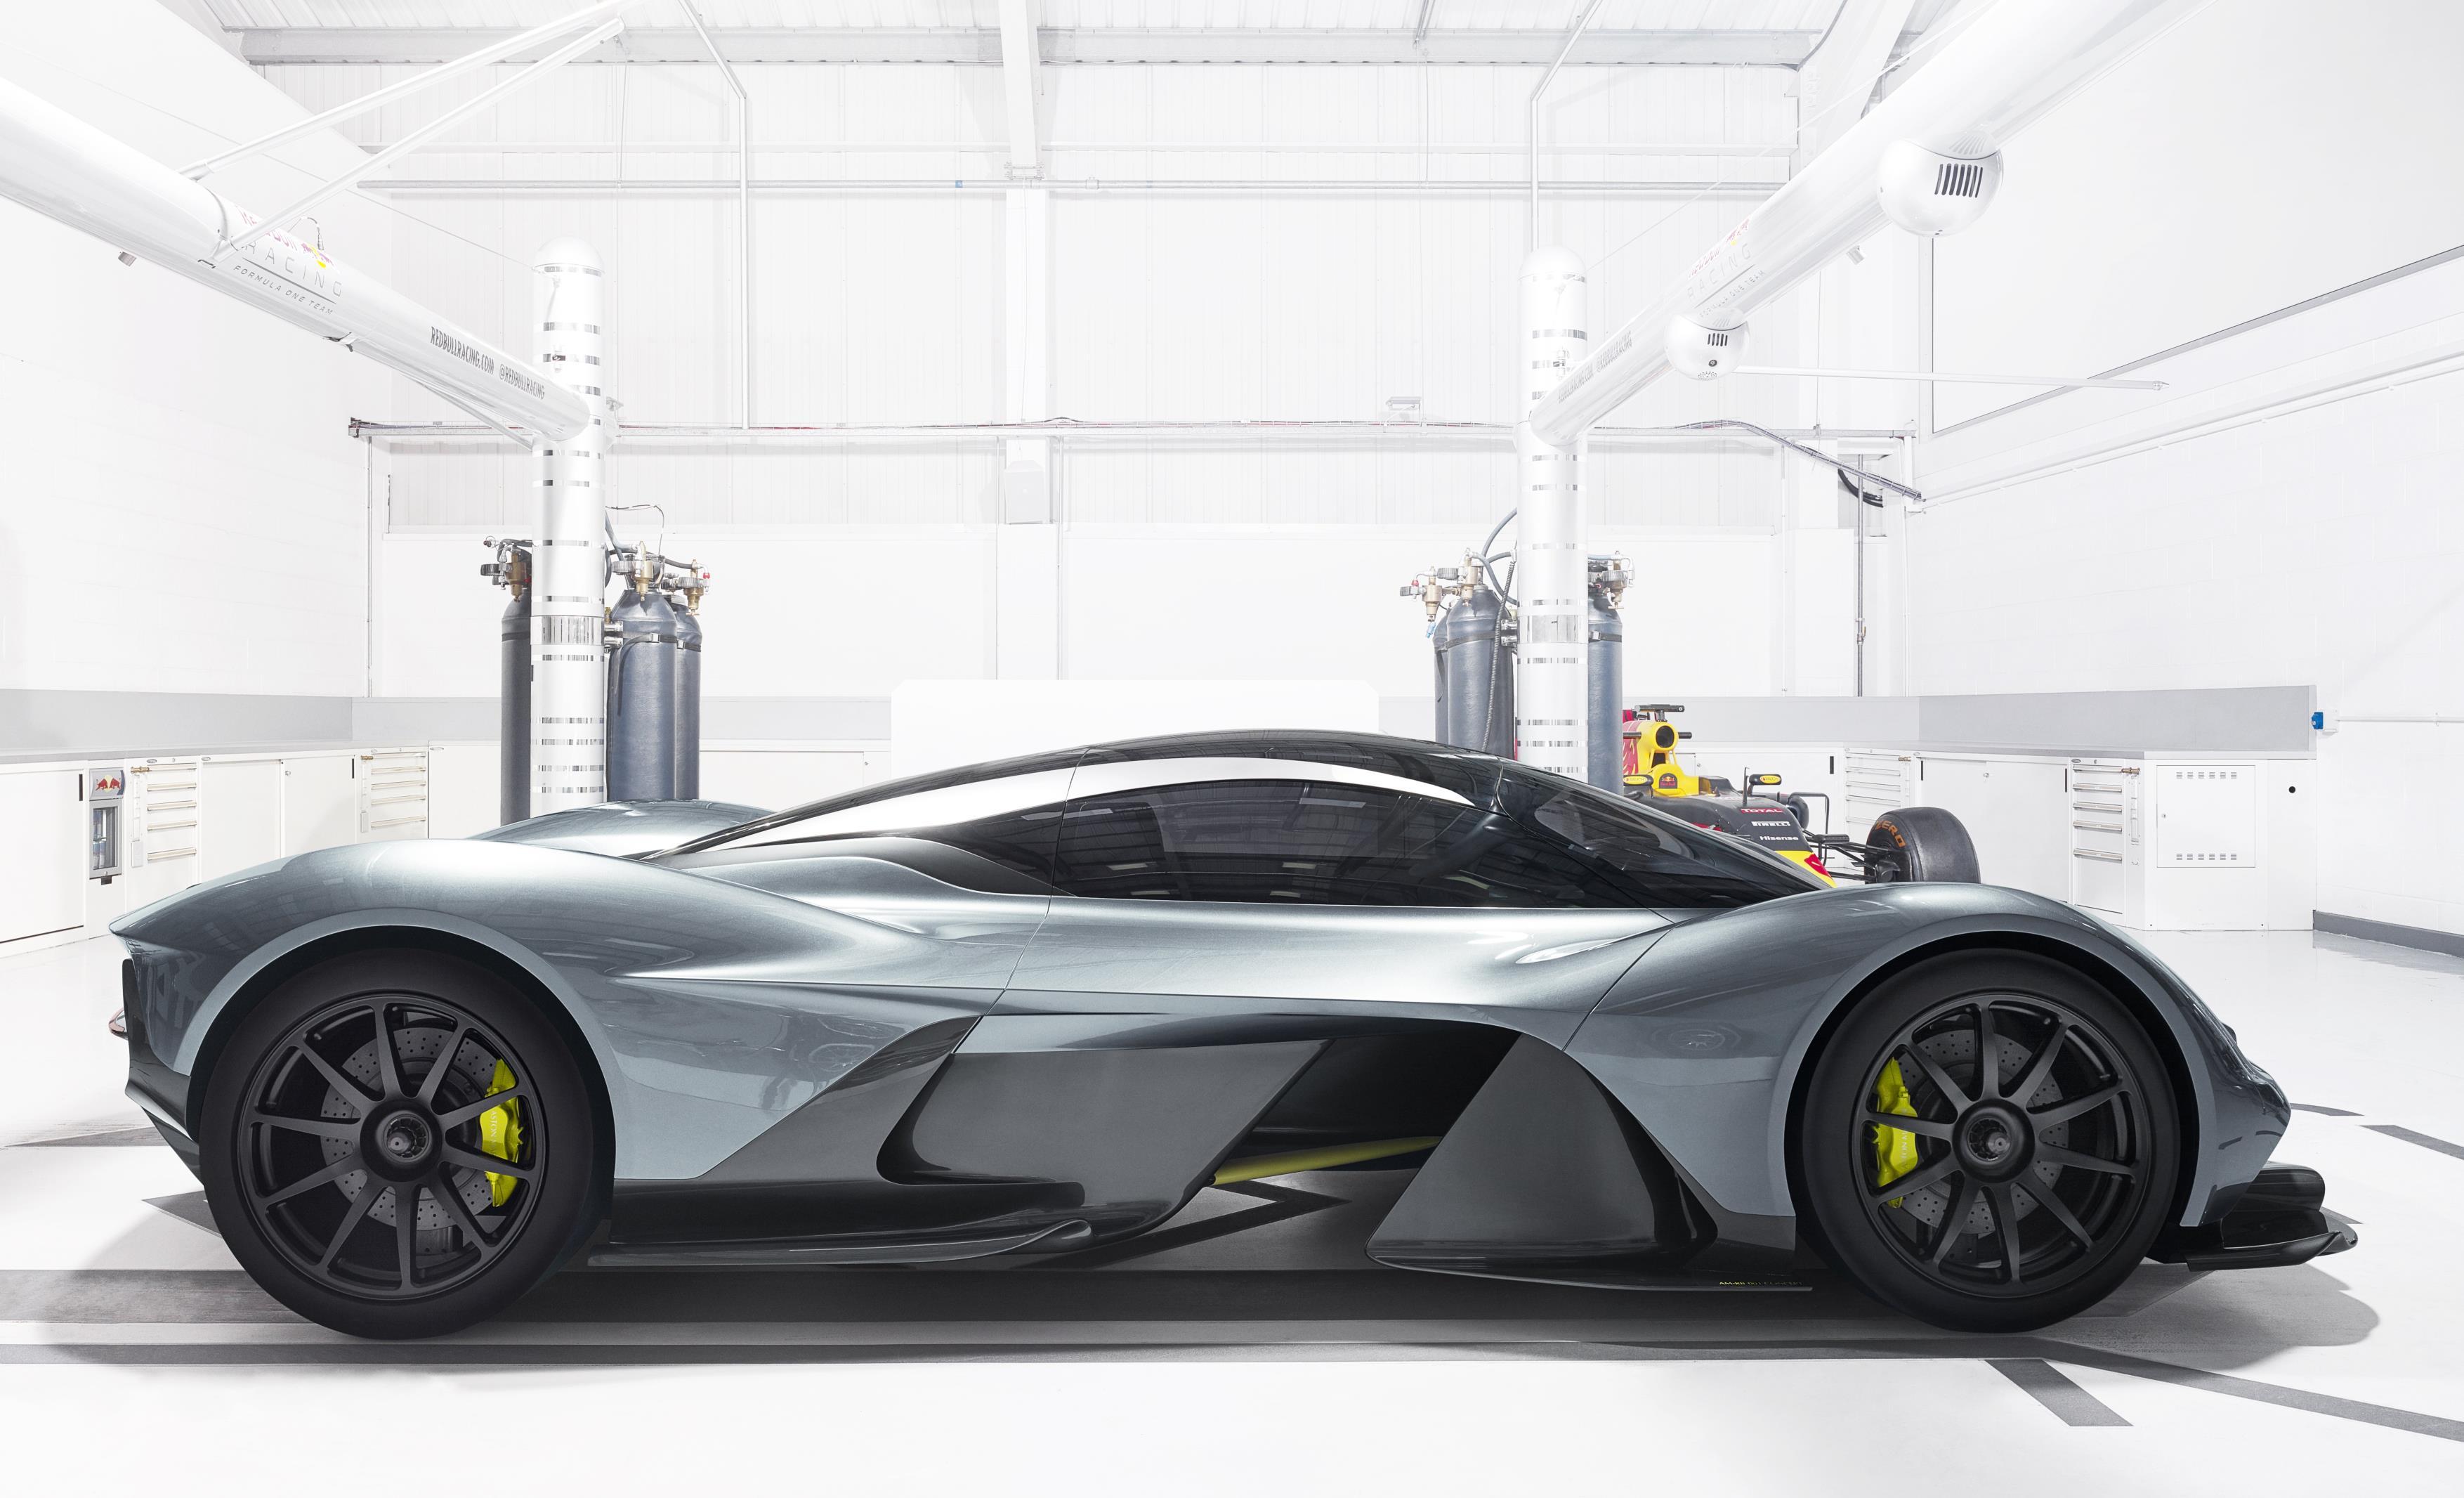 aston martin hypercar specs teased: 250-plus mph (402-plus km/h) top